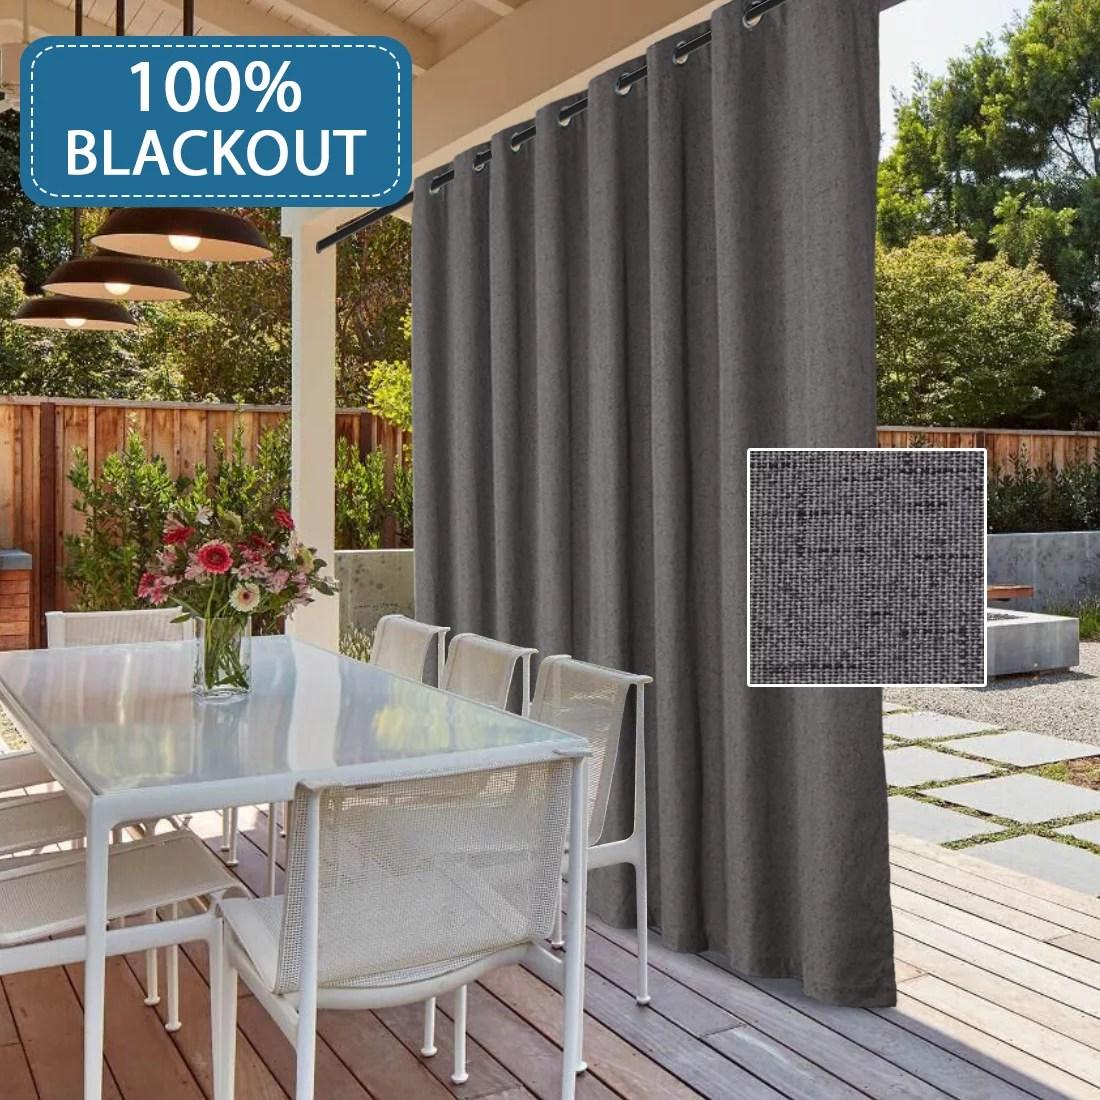 100 blackout textured linen patio door curtains thermal drapes energy efficient waterproof door blinds for sliding glass with anti rust grommet top